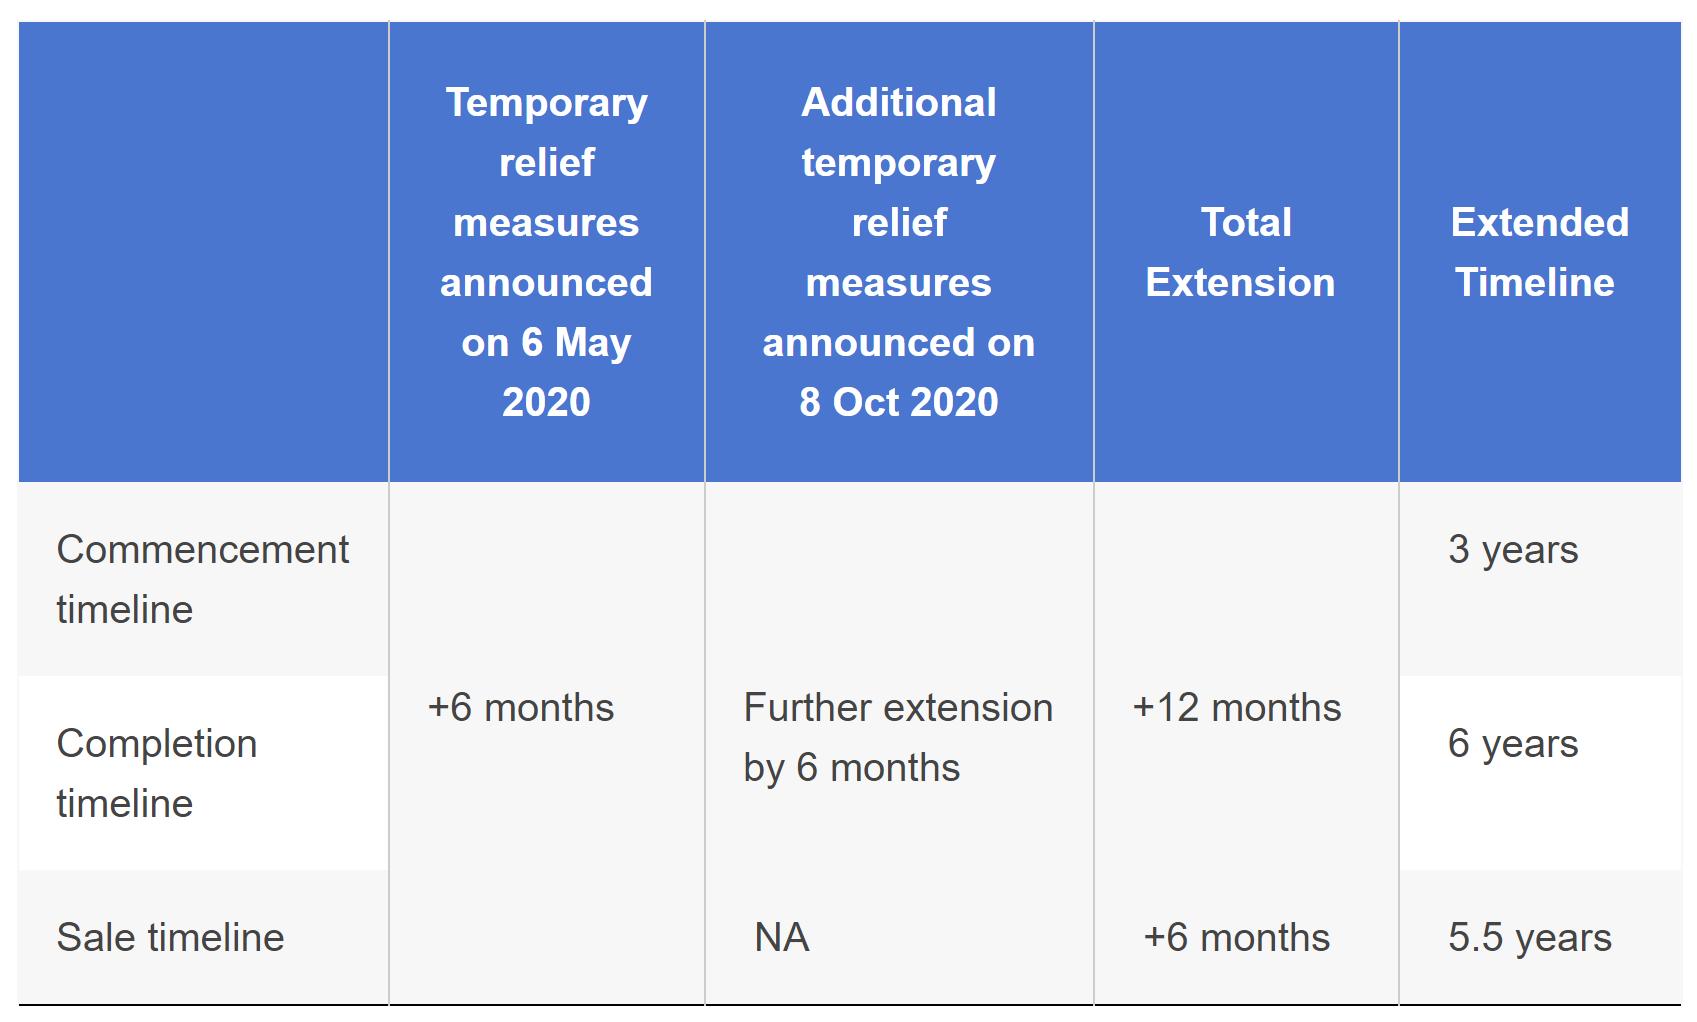 absd remission extension qc timeline developers